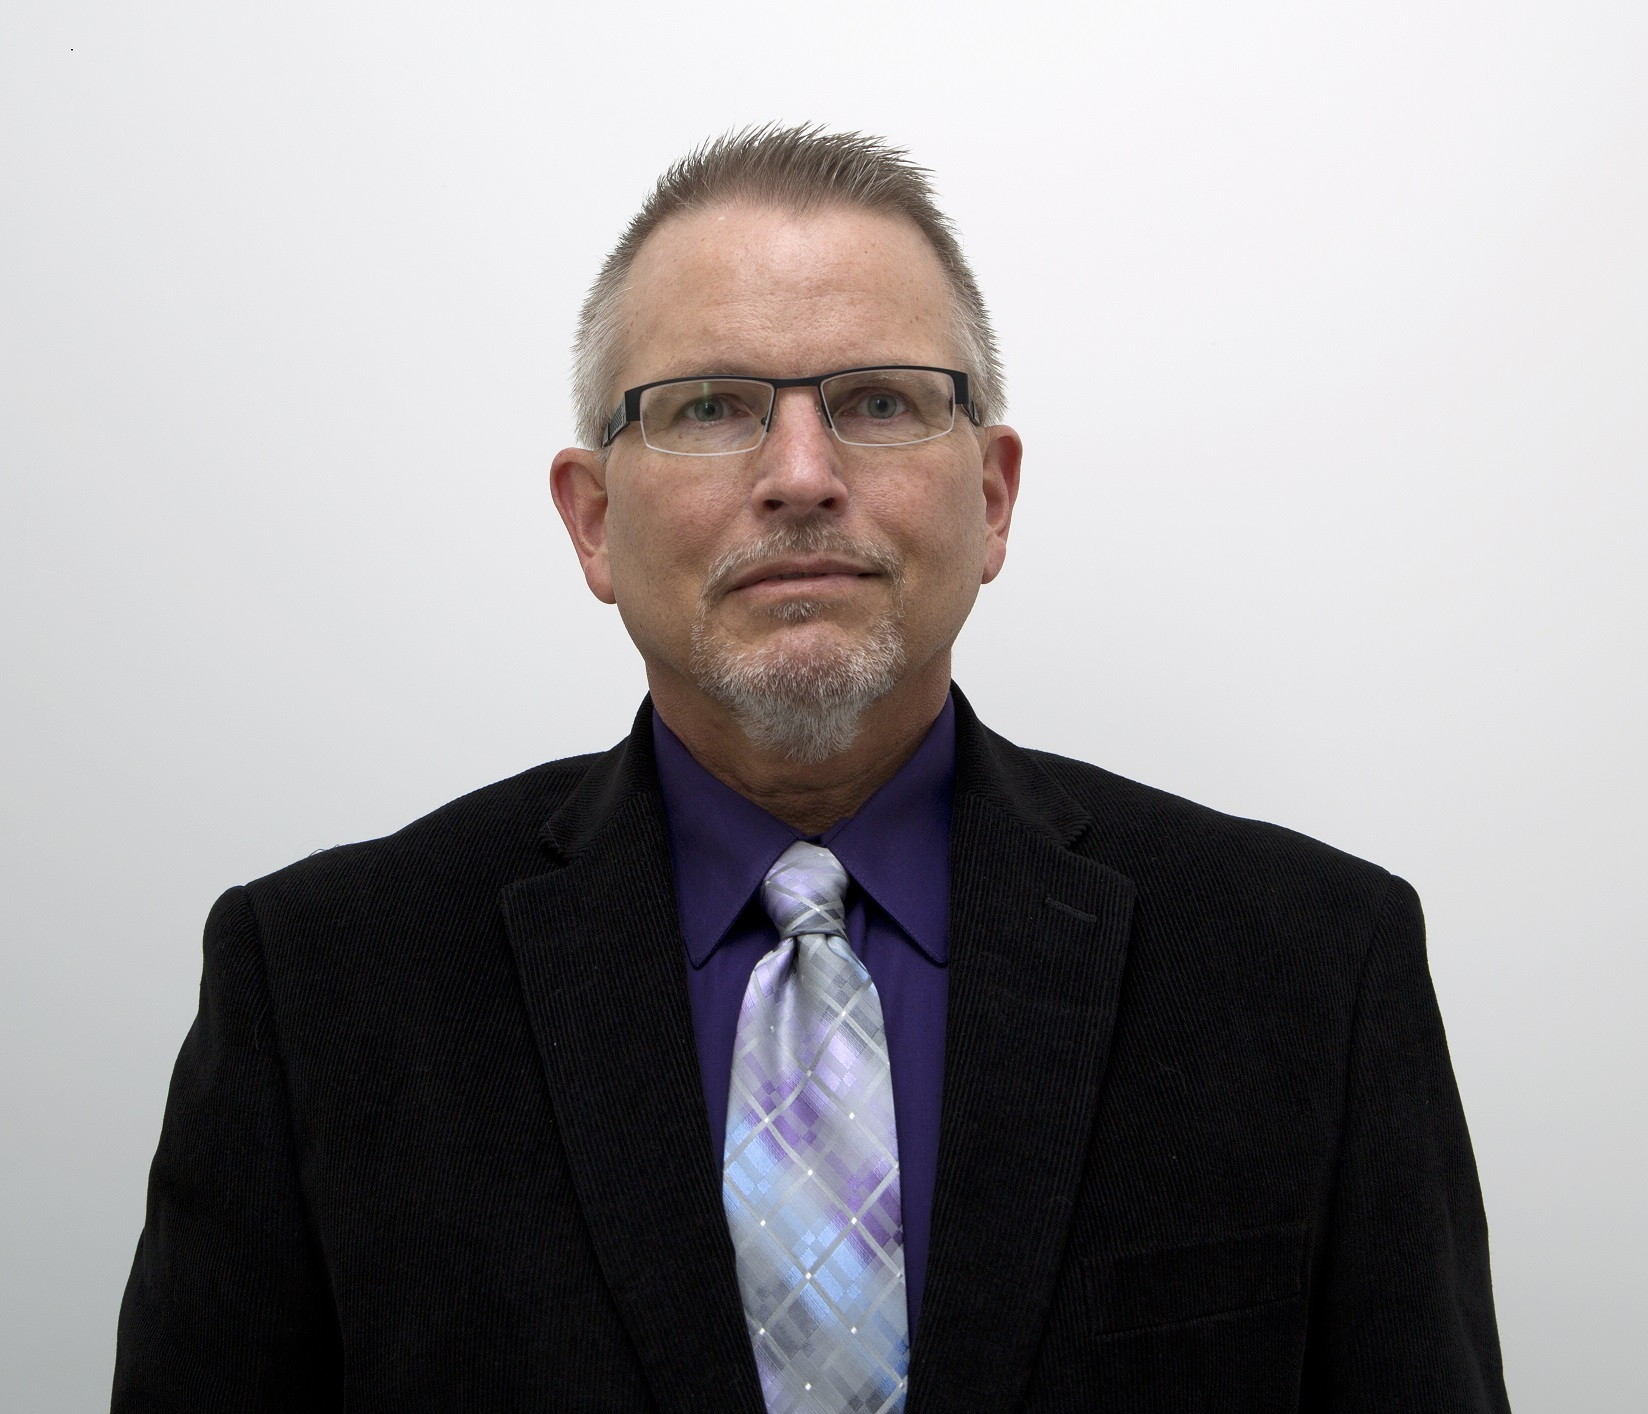 Dr. Bruce A. Johnson